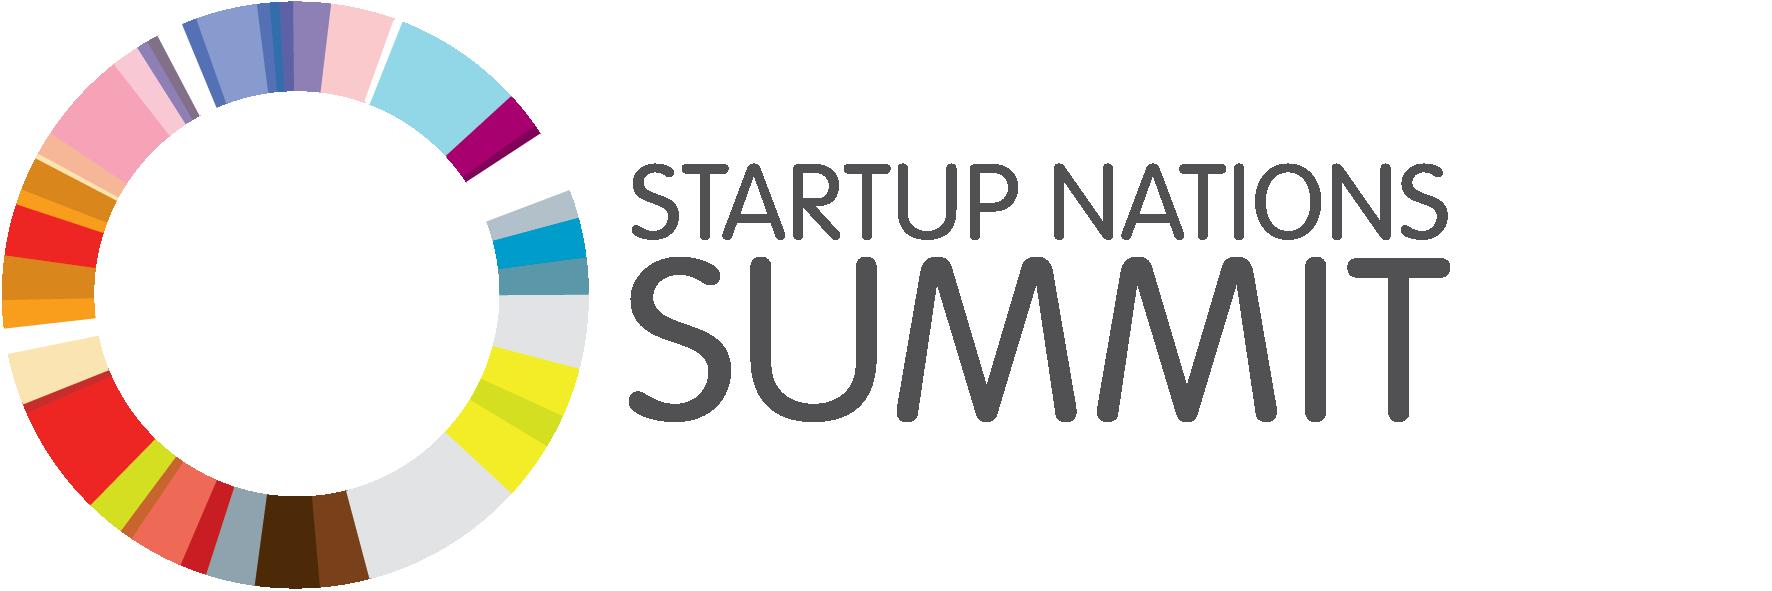 STARTUP_NATIONS_SUMMIT